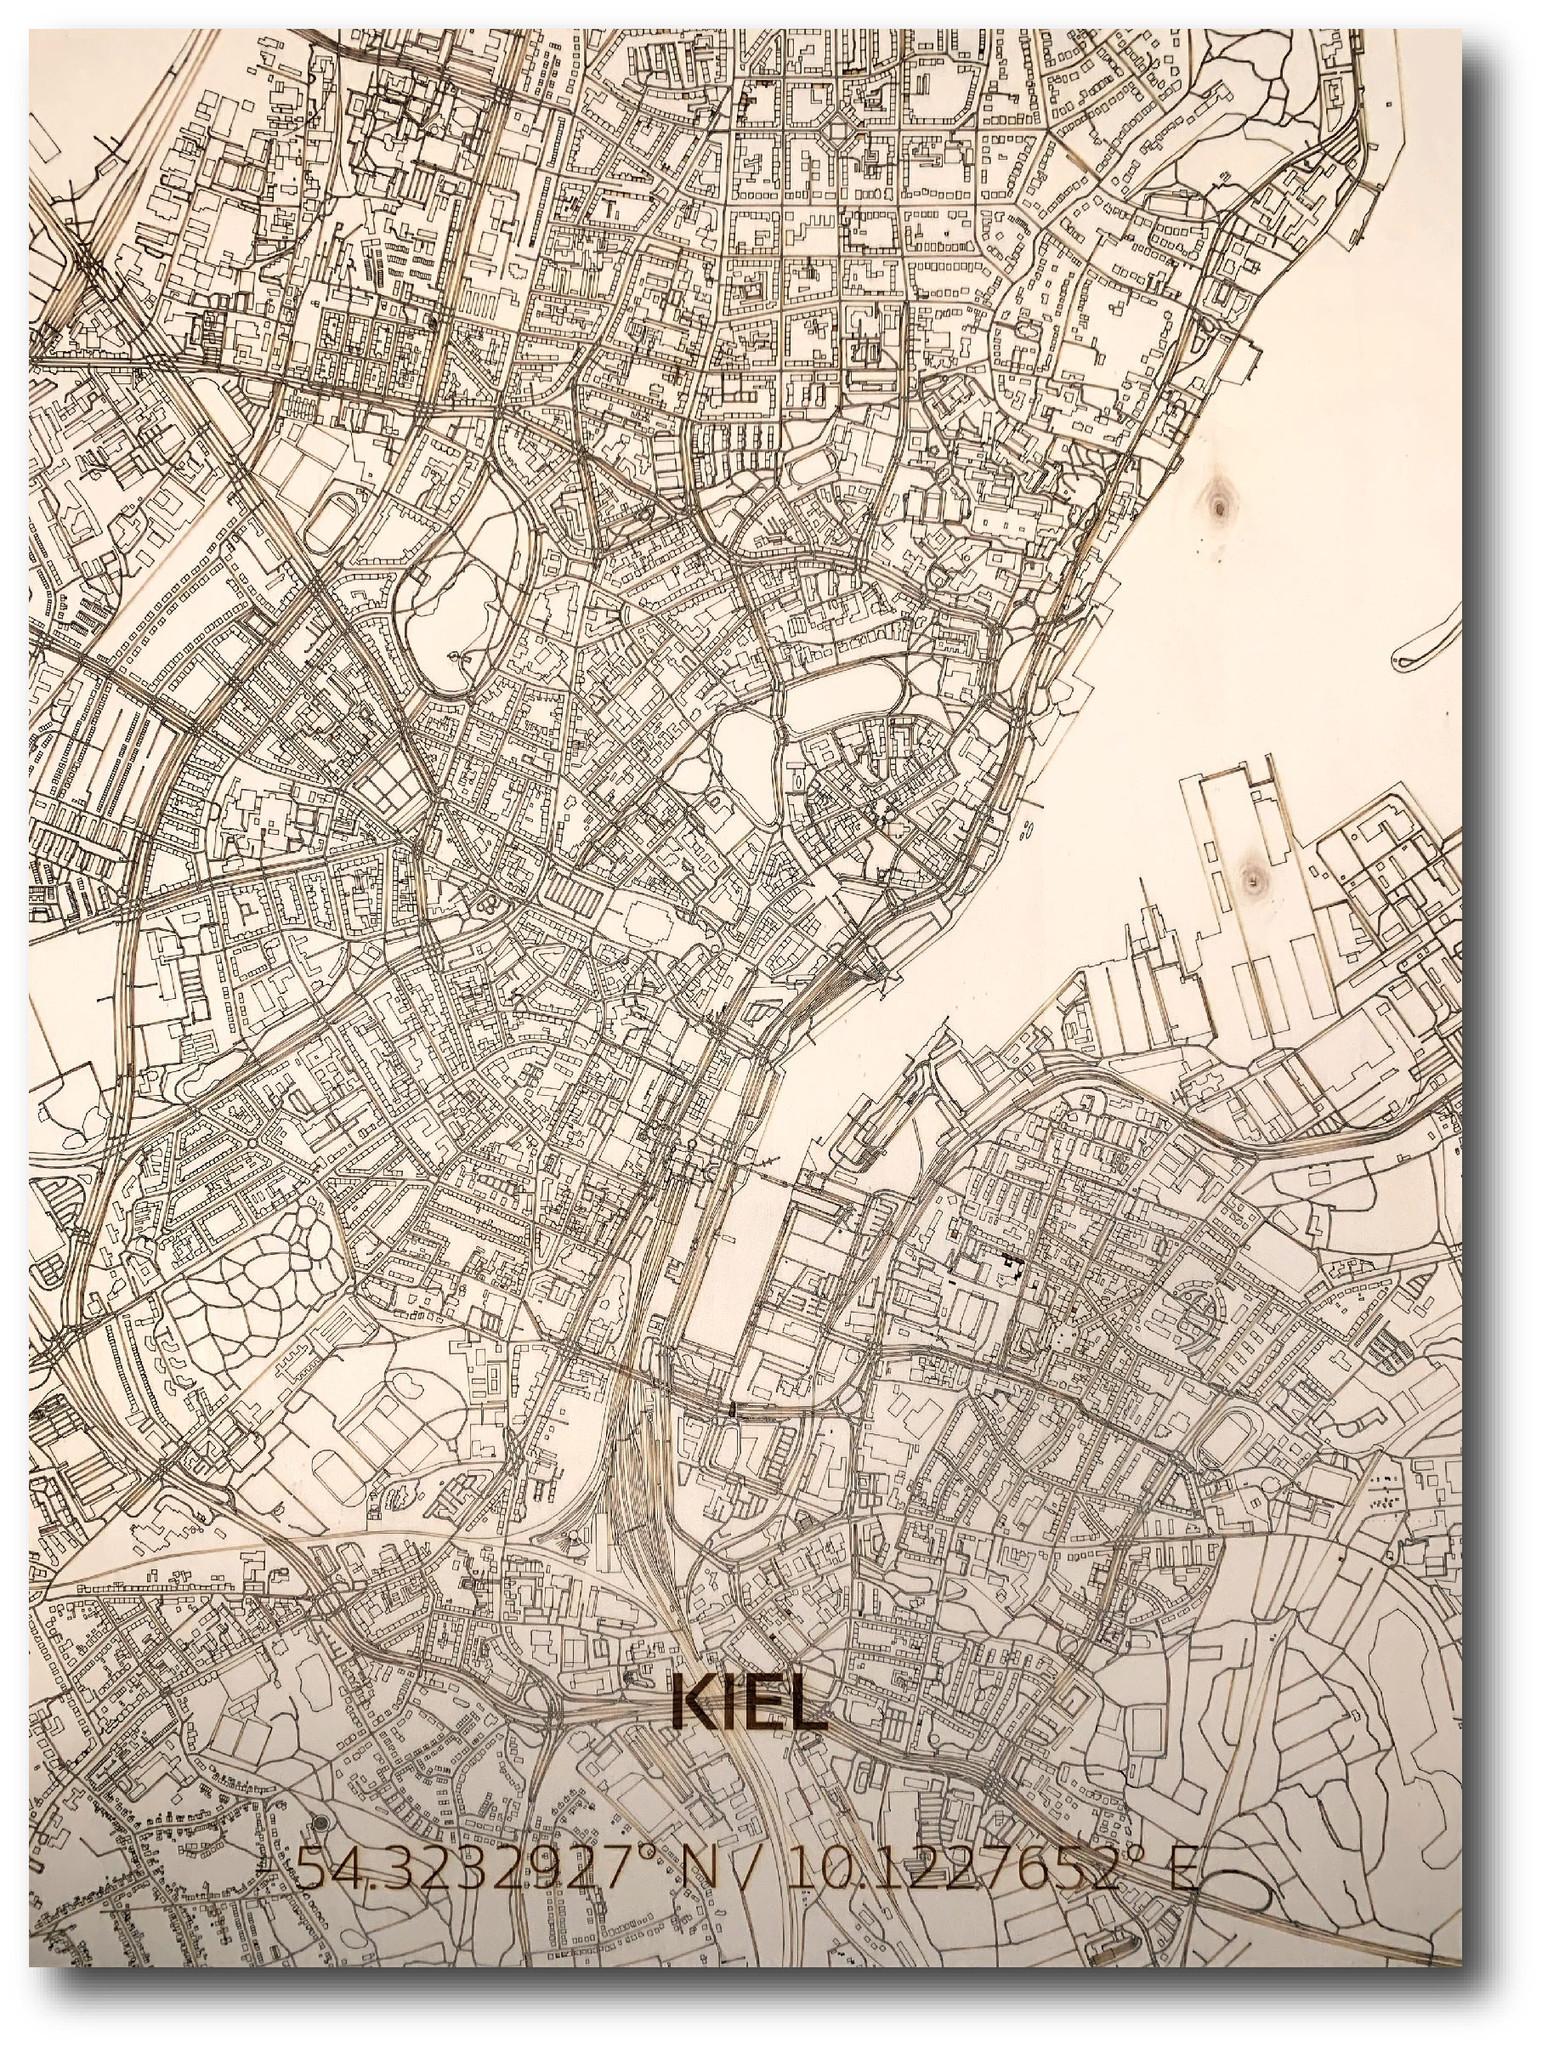 WOODEN WALL DECORATION Kiel CITYMAP-1